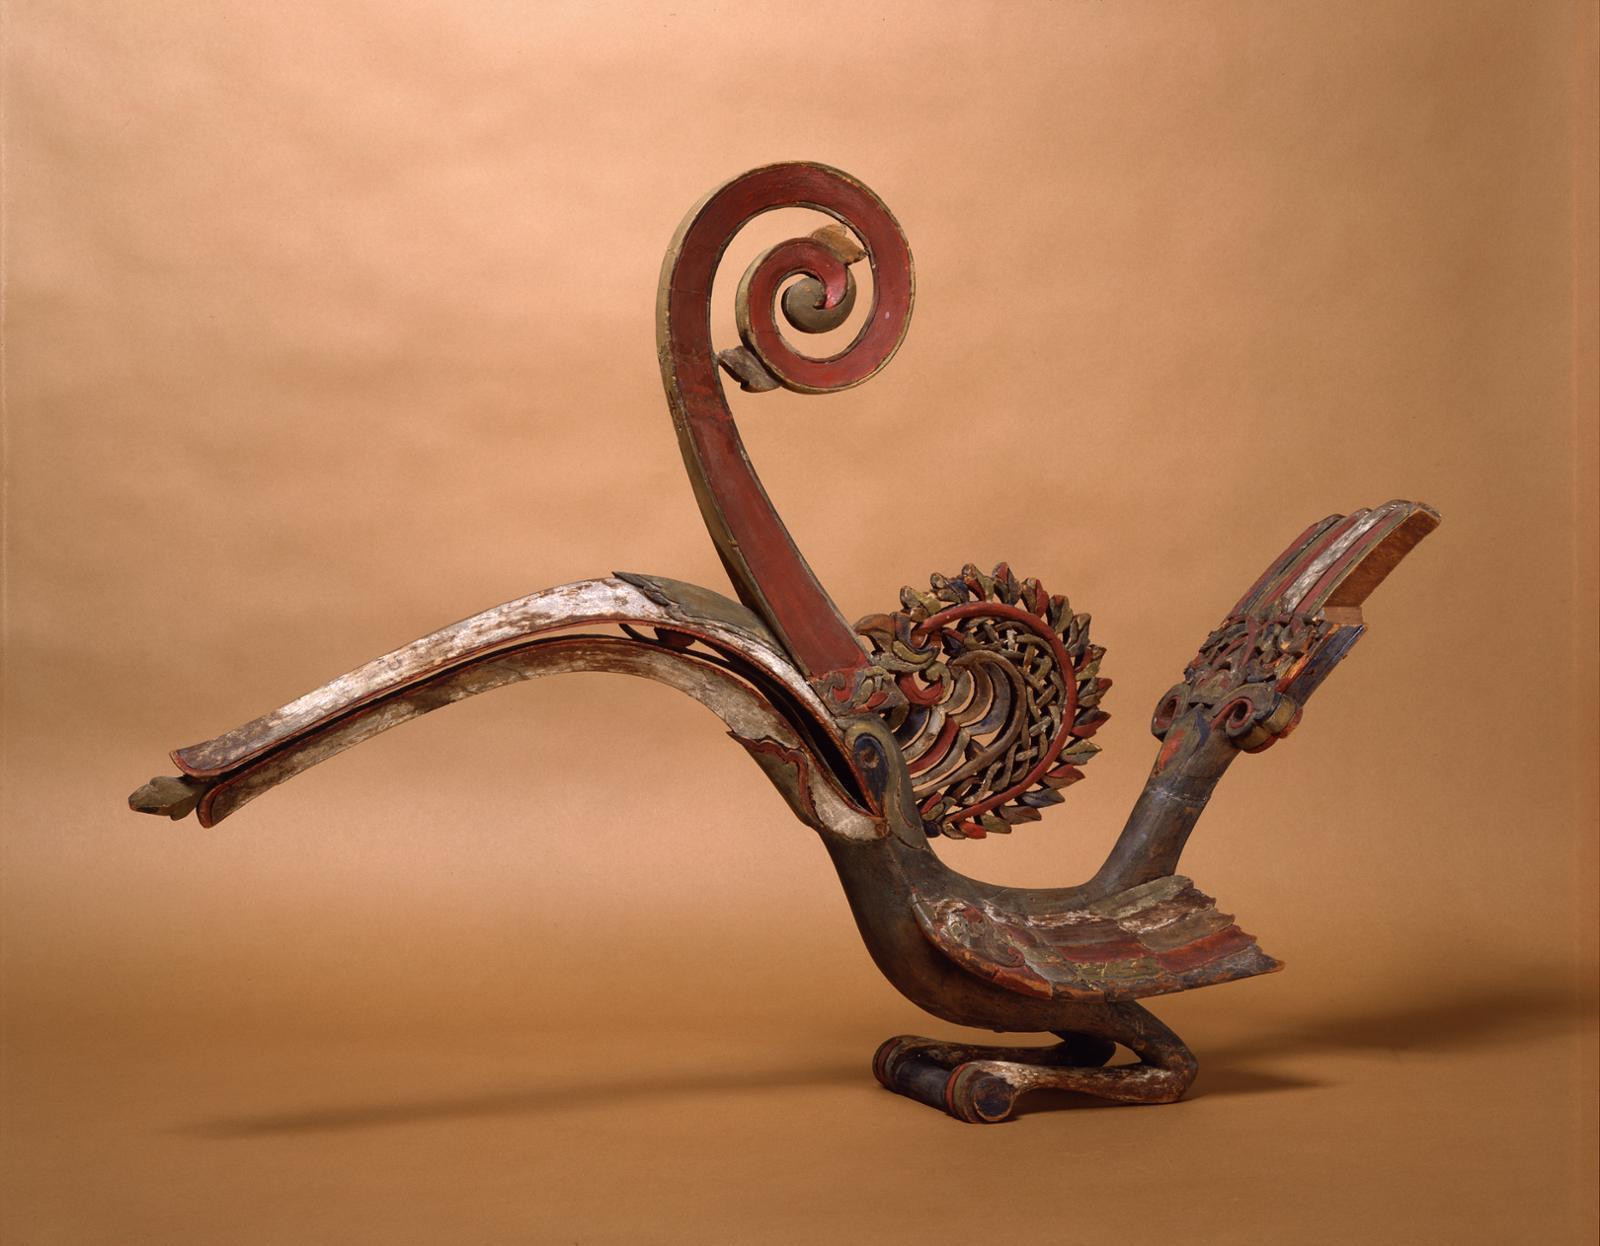 Hornbill Figure   Kenyalang   Gift of Dr. William H. Furness 3rd, 1898   Object #: P815B   Penn Museum